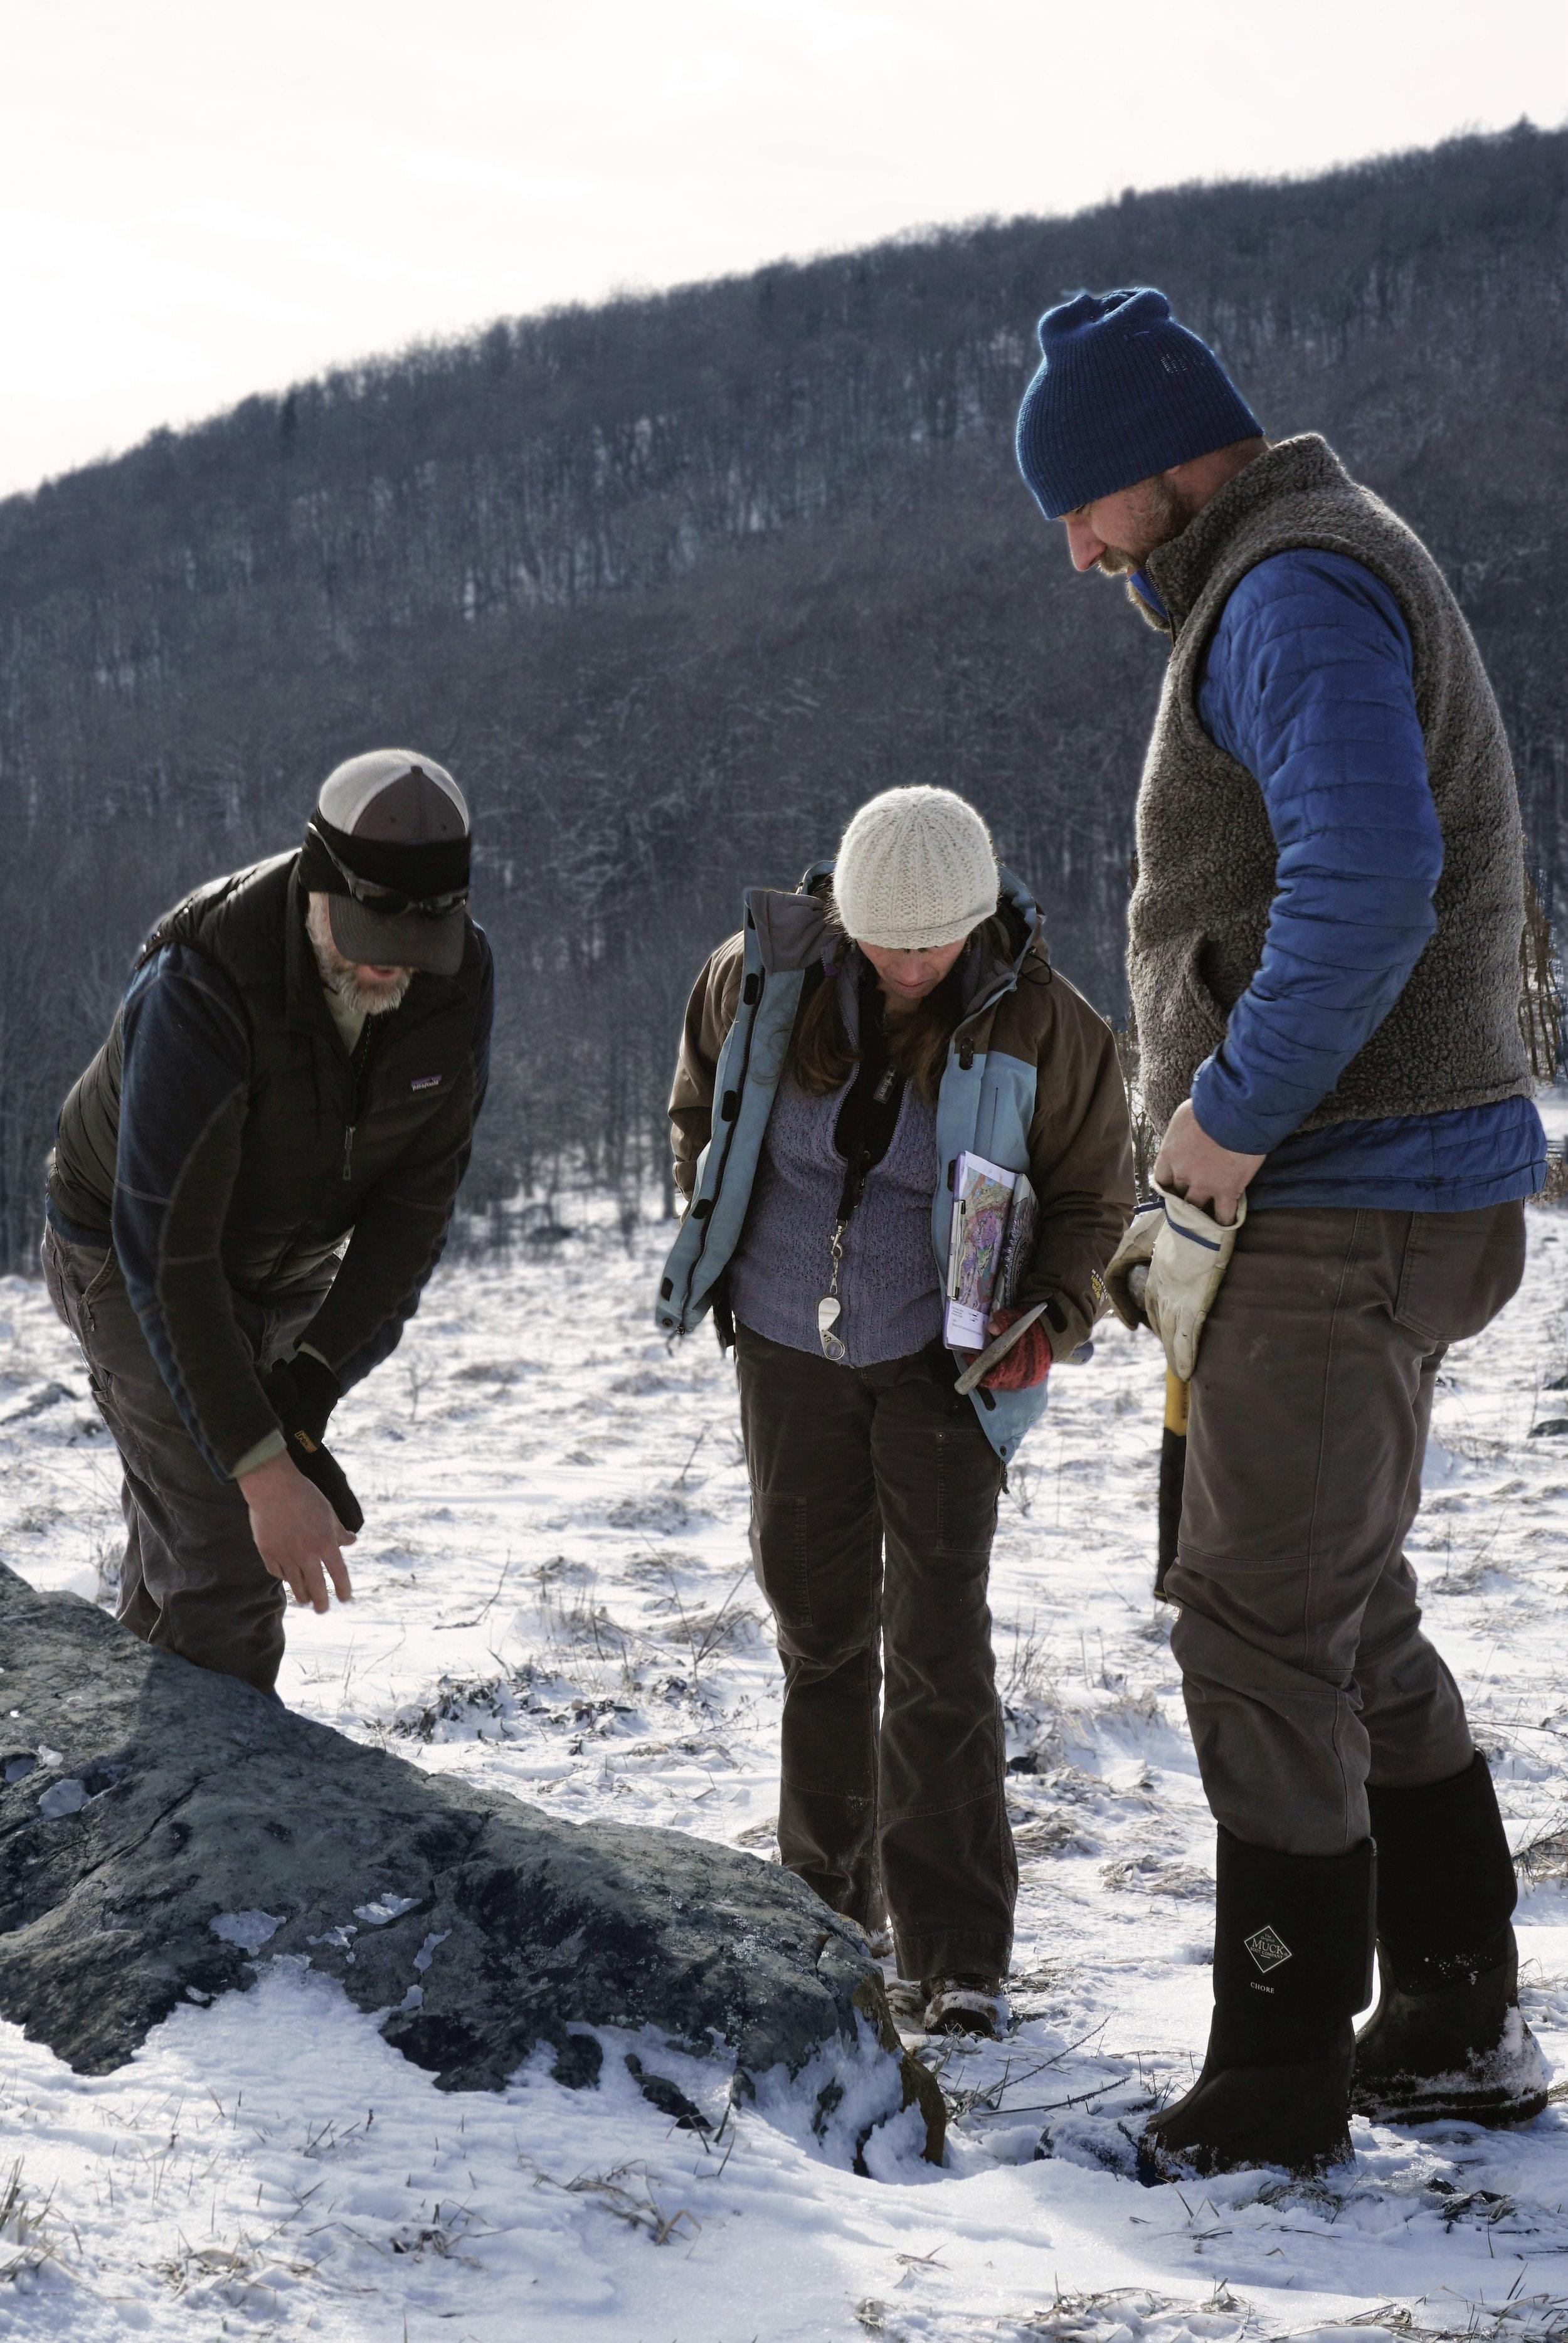 Jay, Elaine, and Aaron observing greenstone at Elk Garden.